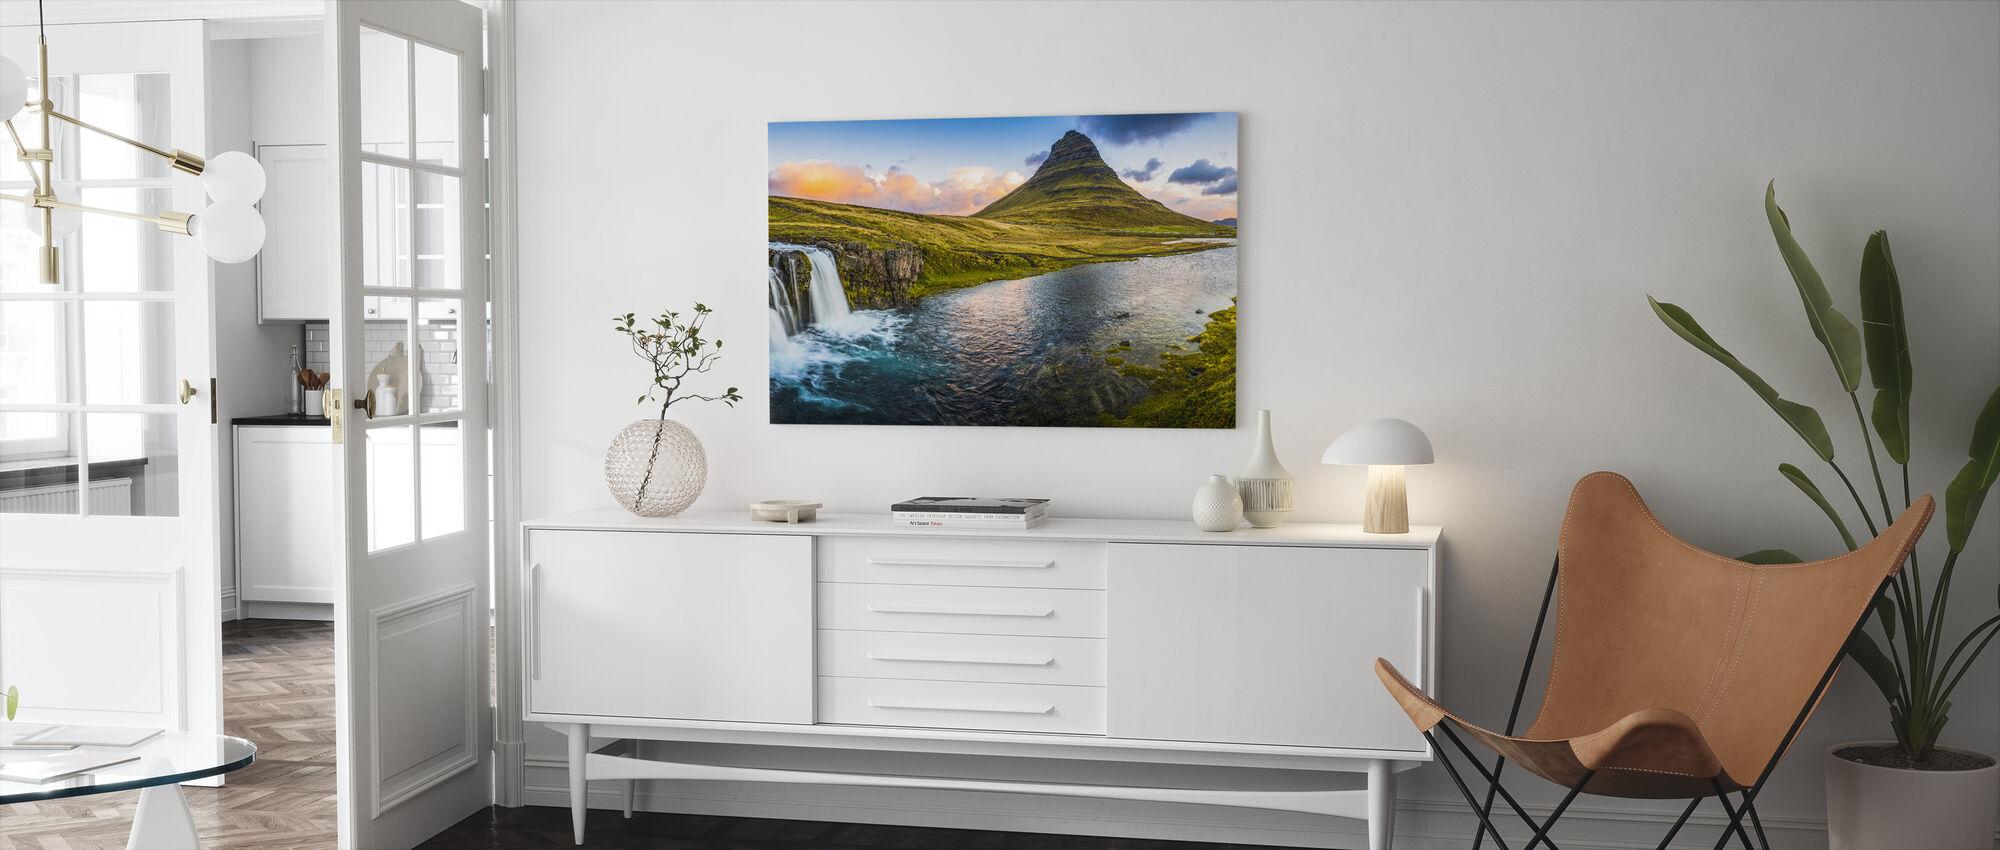 Idyllischer Bergwasserfall - Leinwandbild - Wohnzimmer